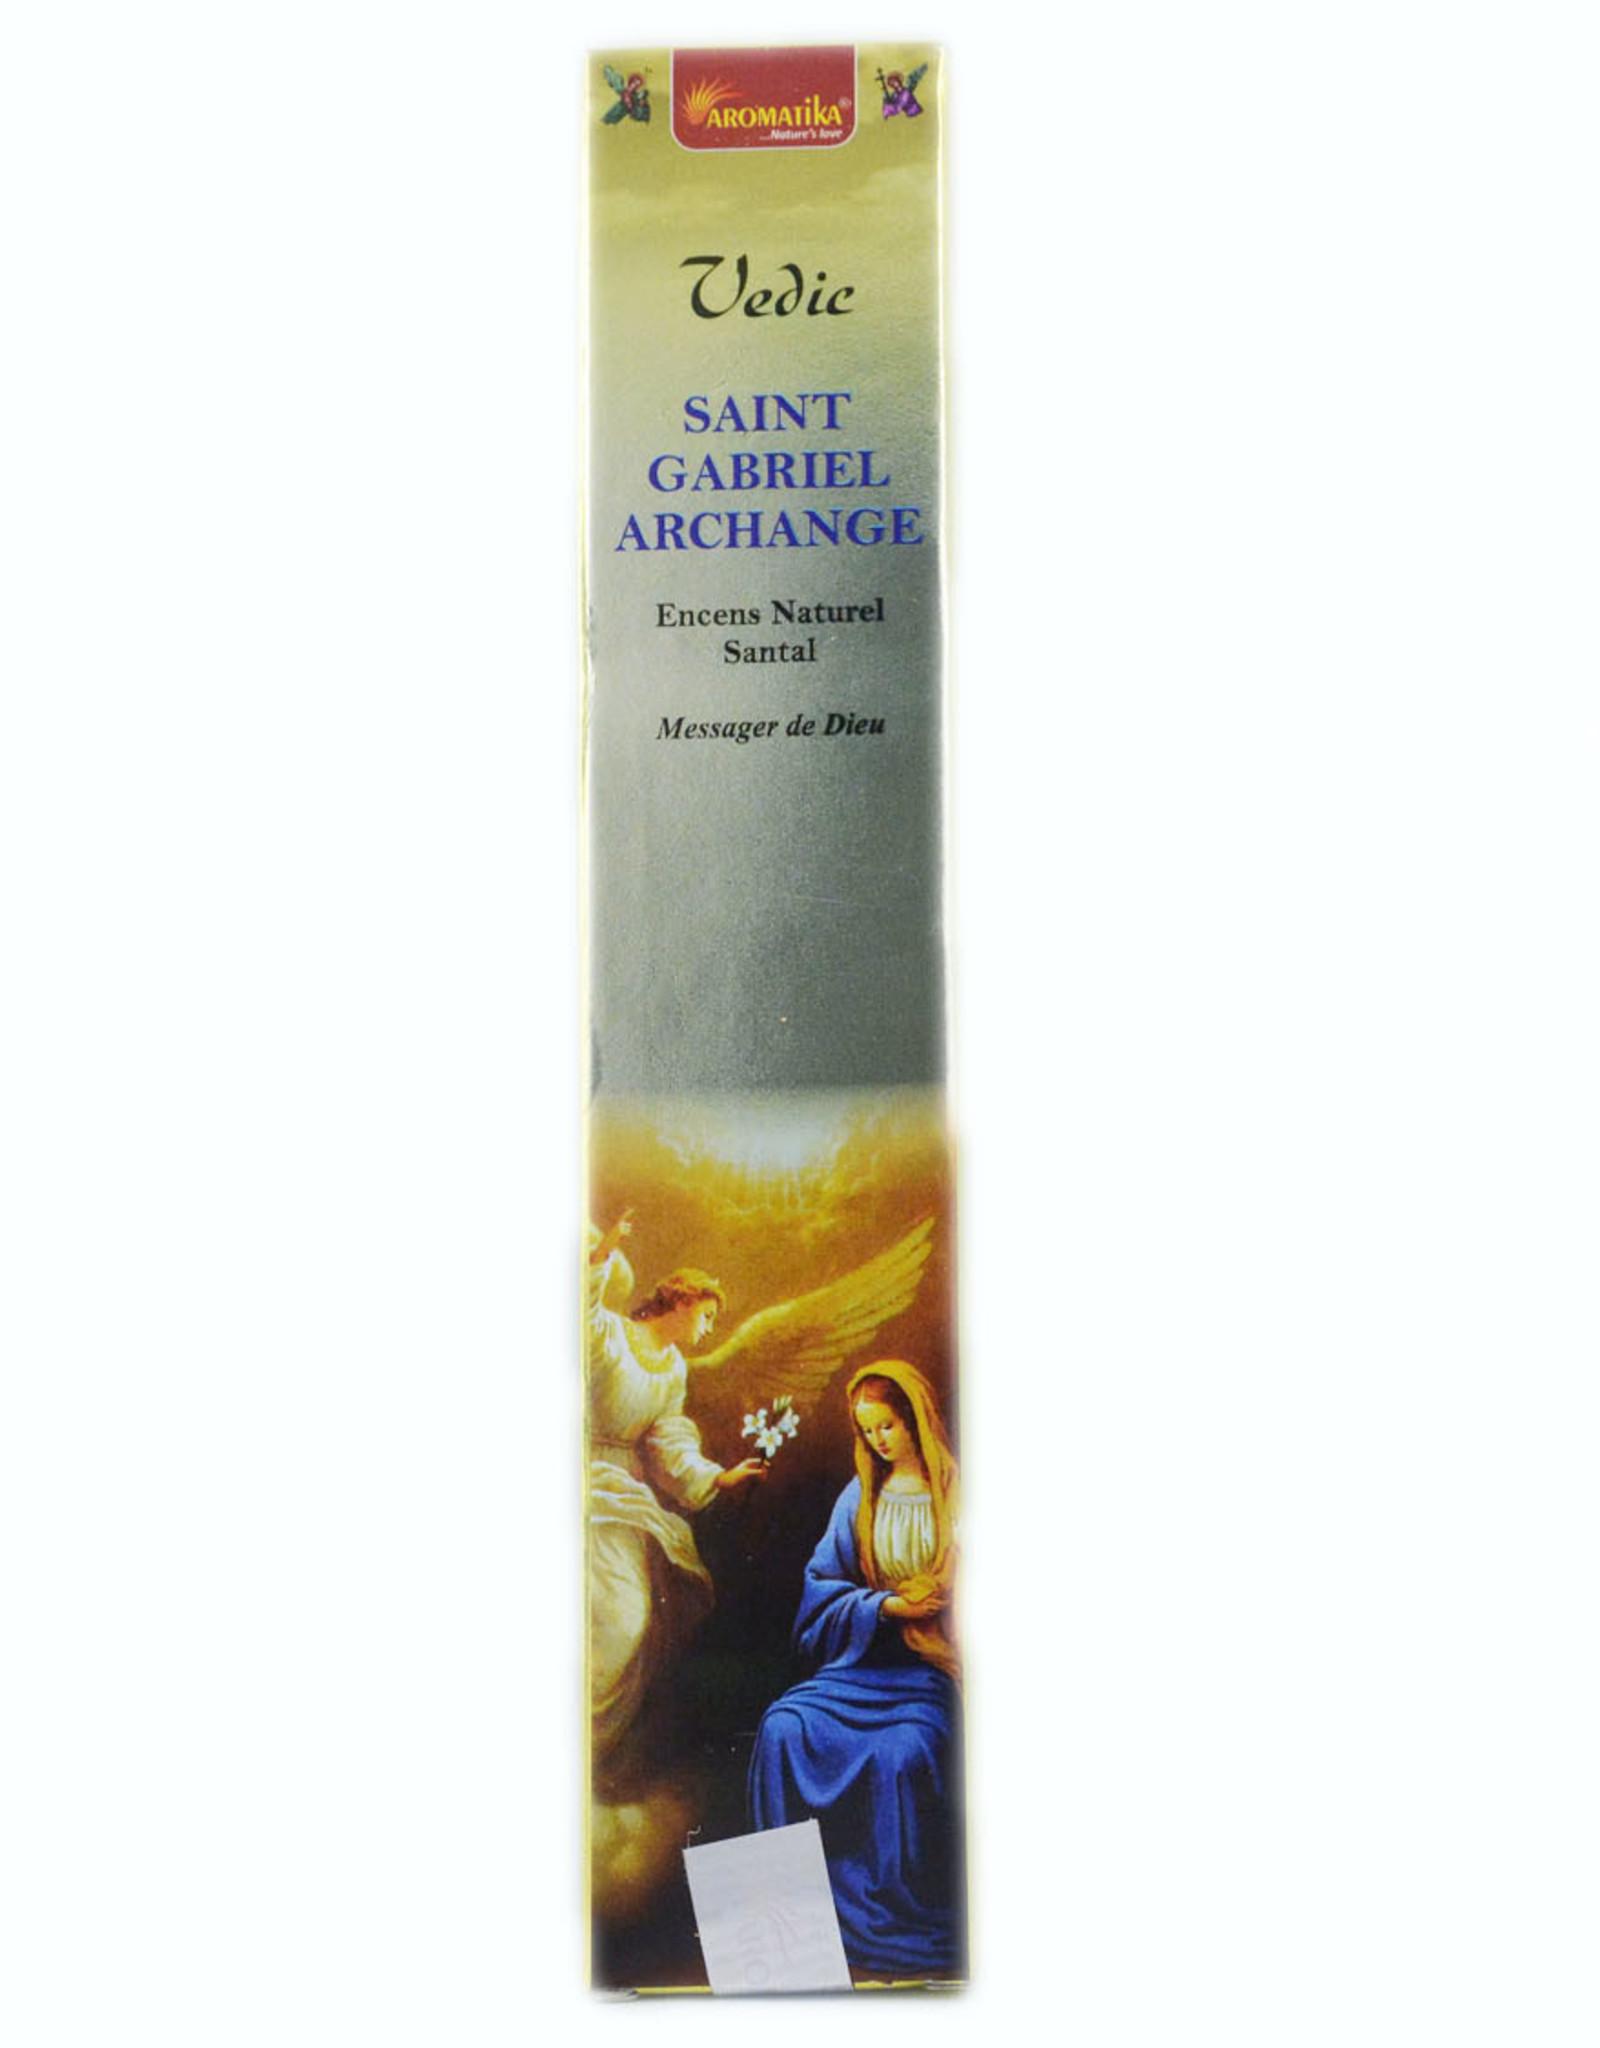 Aromatika Incense Sticks Archangel Saint Gabriel 12 pcs 15 g.